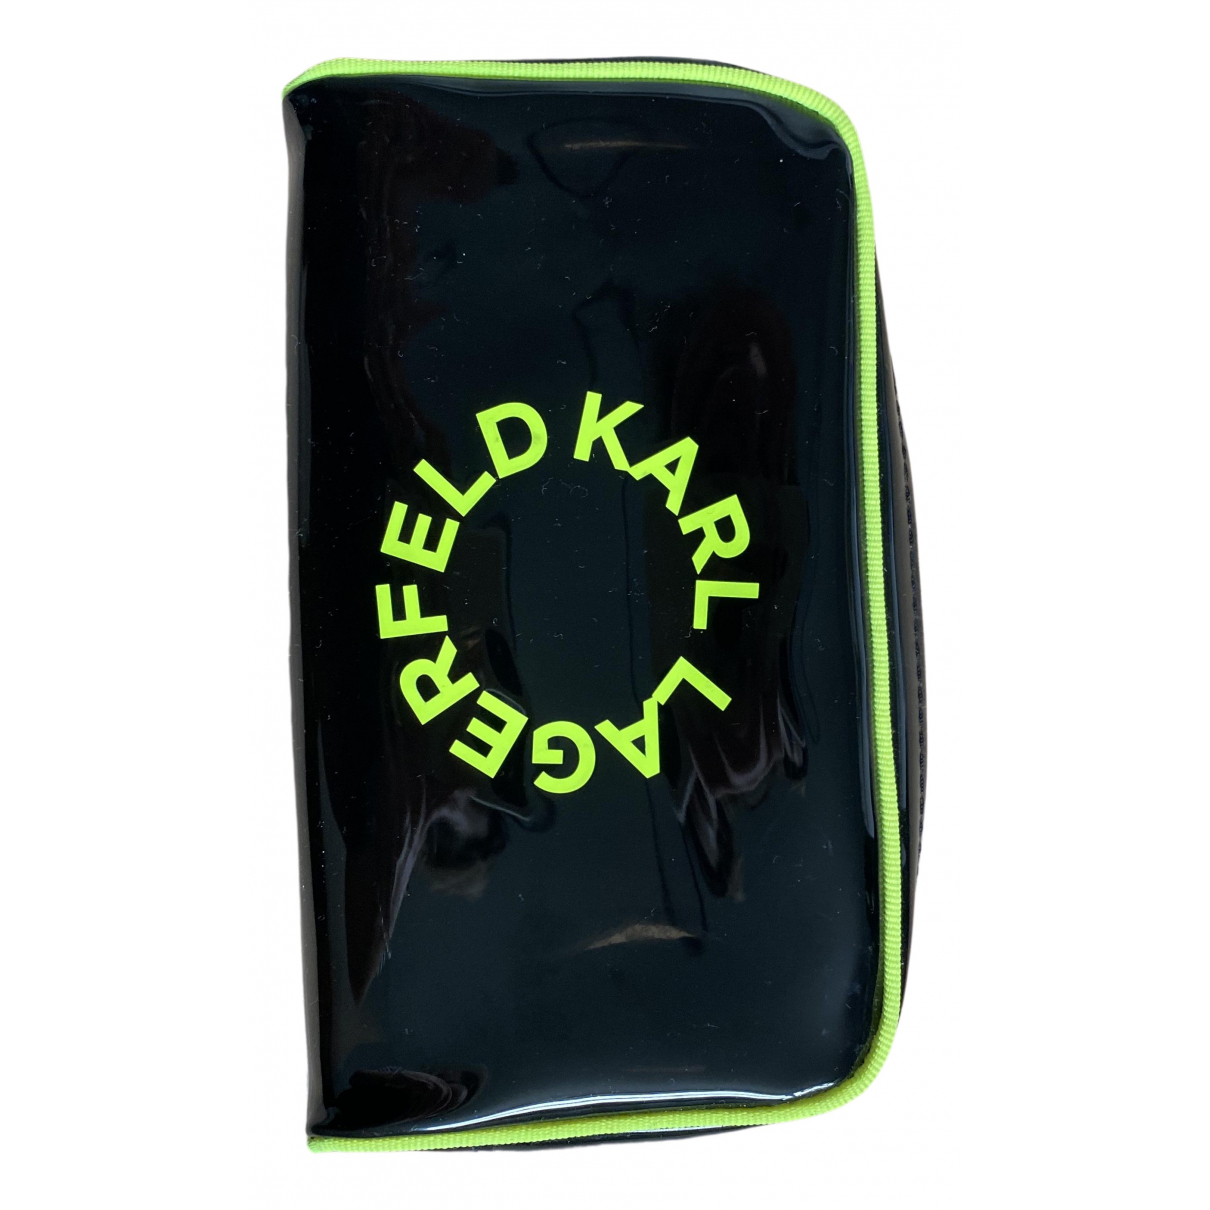 Karl \N Kleinlederwaren in  Schwarz Kunststoff